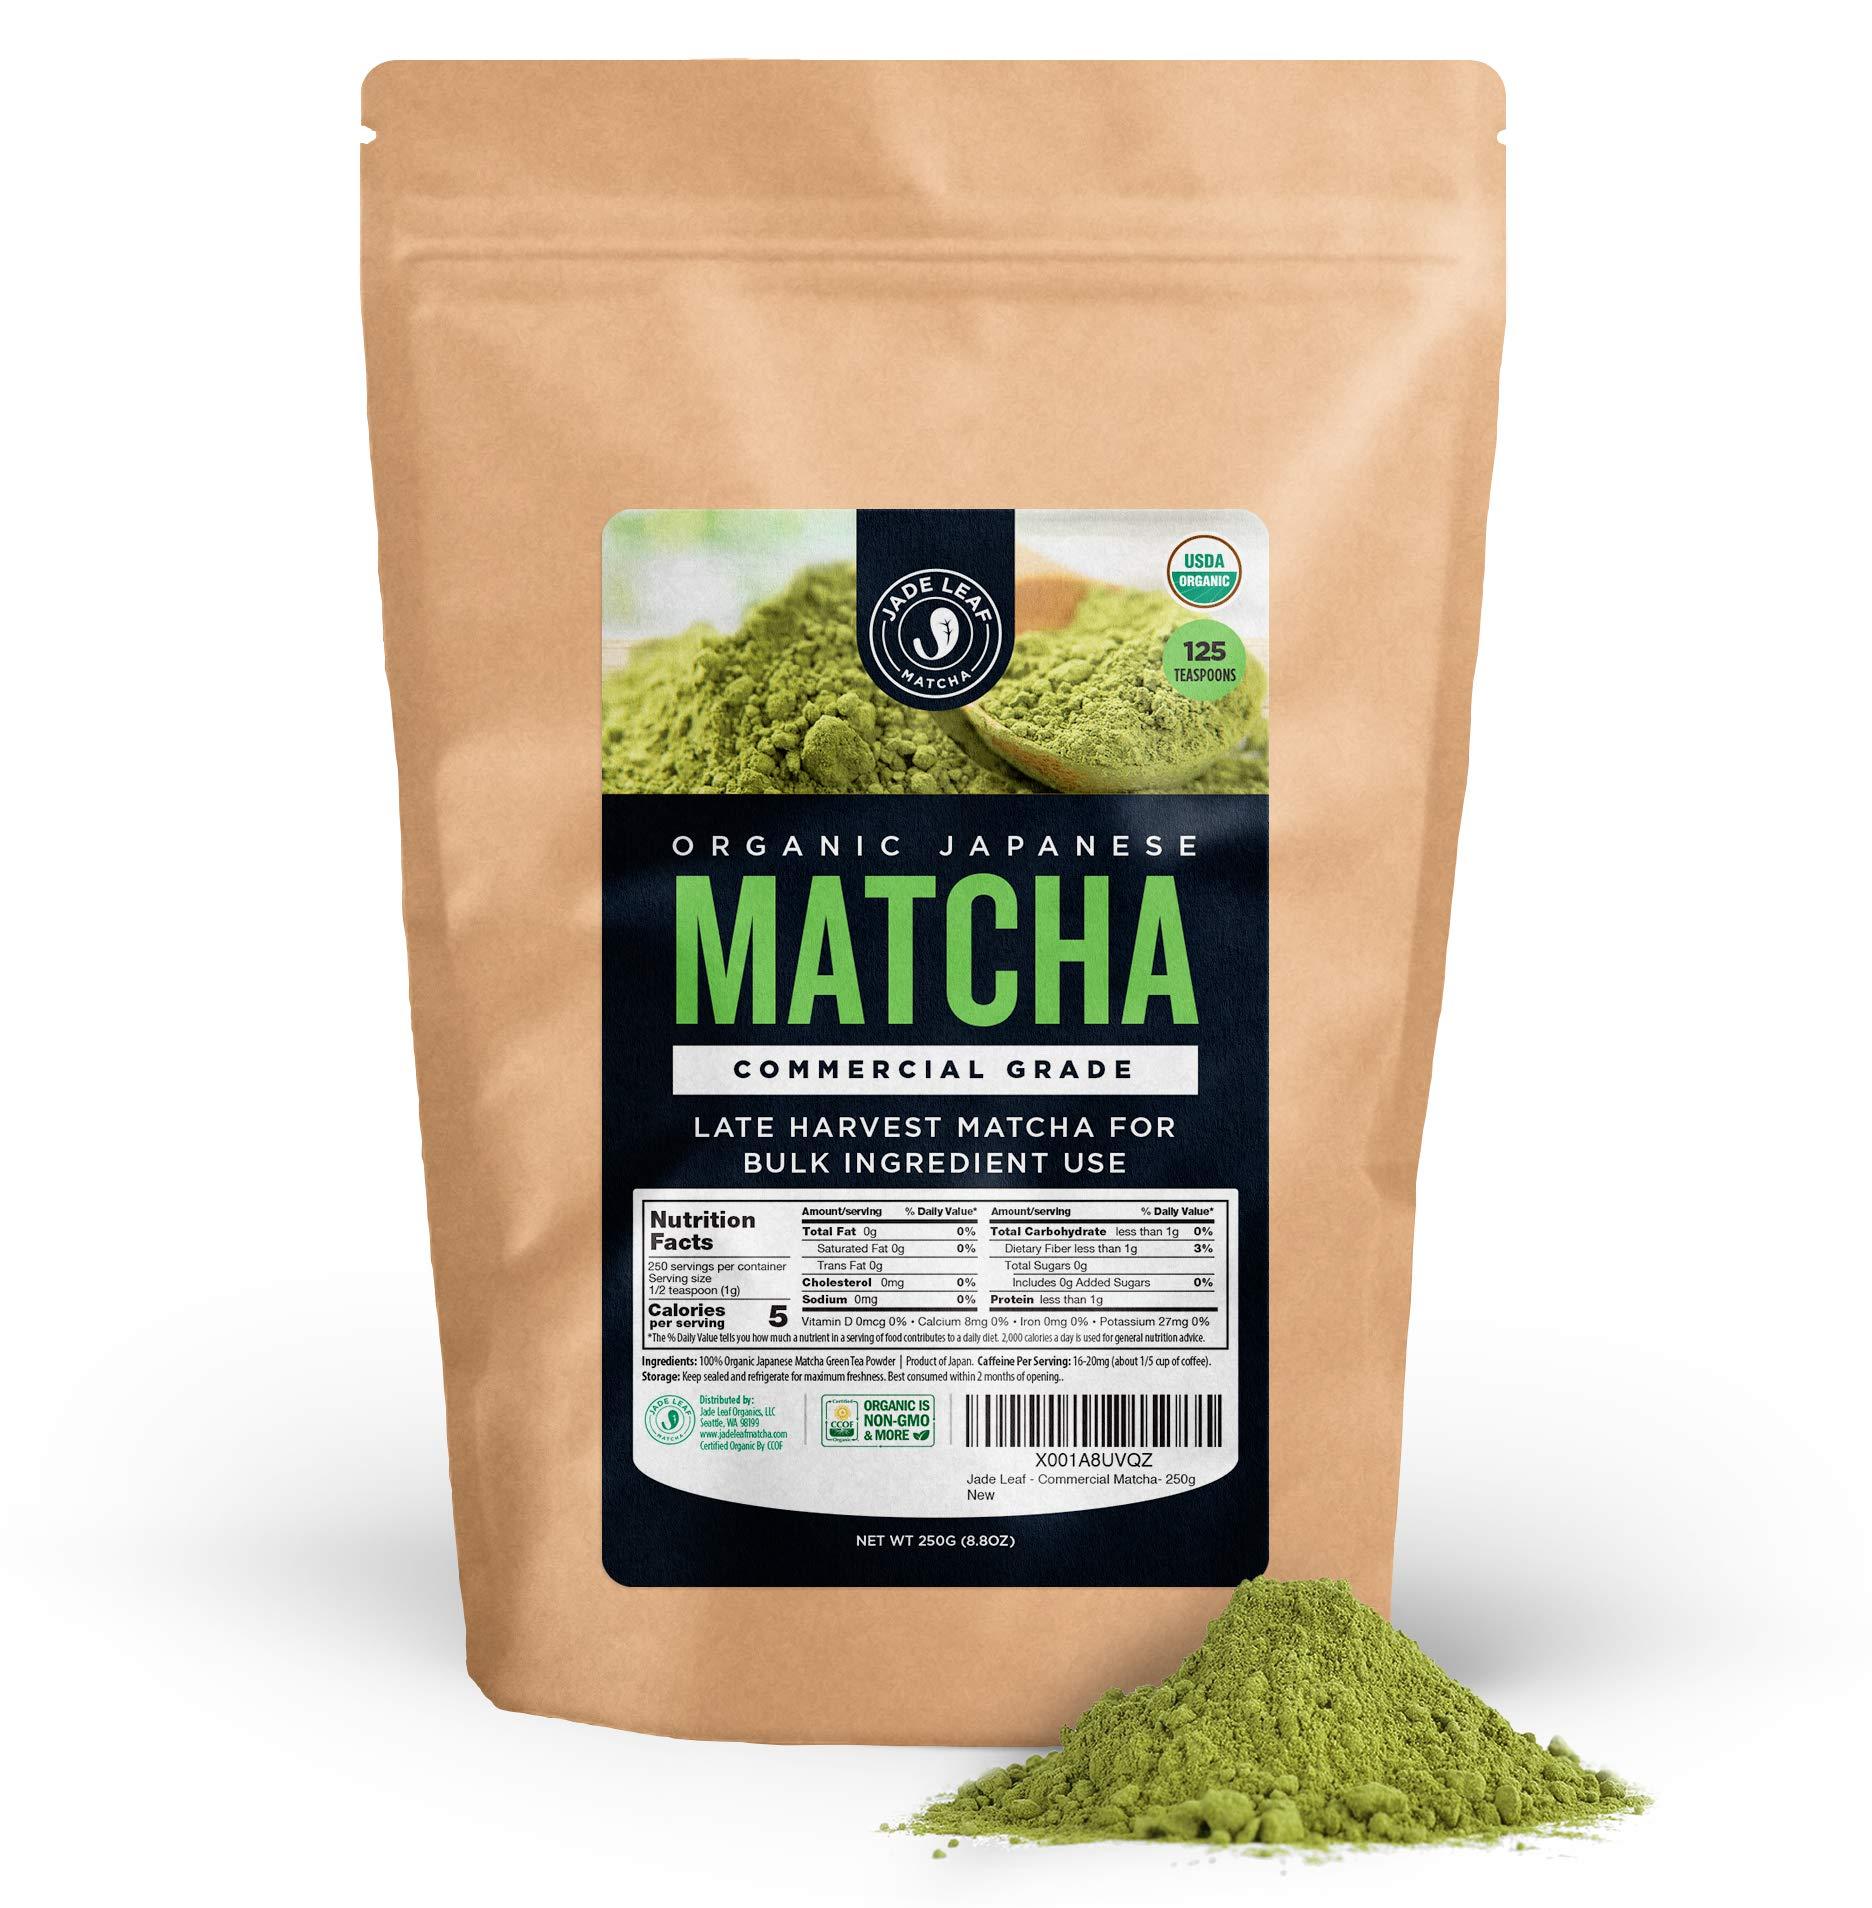 Jade Leaf - Organic Japanese Matcha Green Tea Powder, Commercial Grade - [250g Value Size] by Jade Leaf Matcha